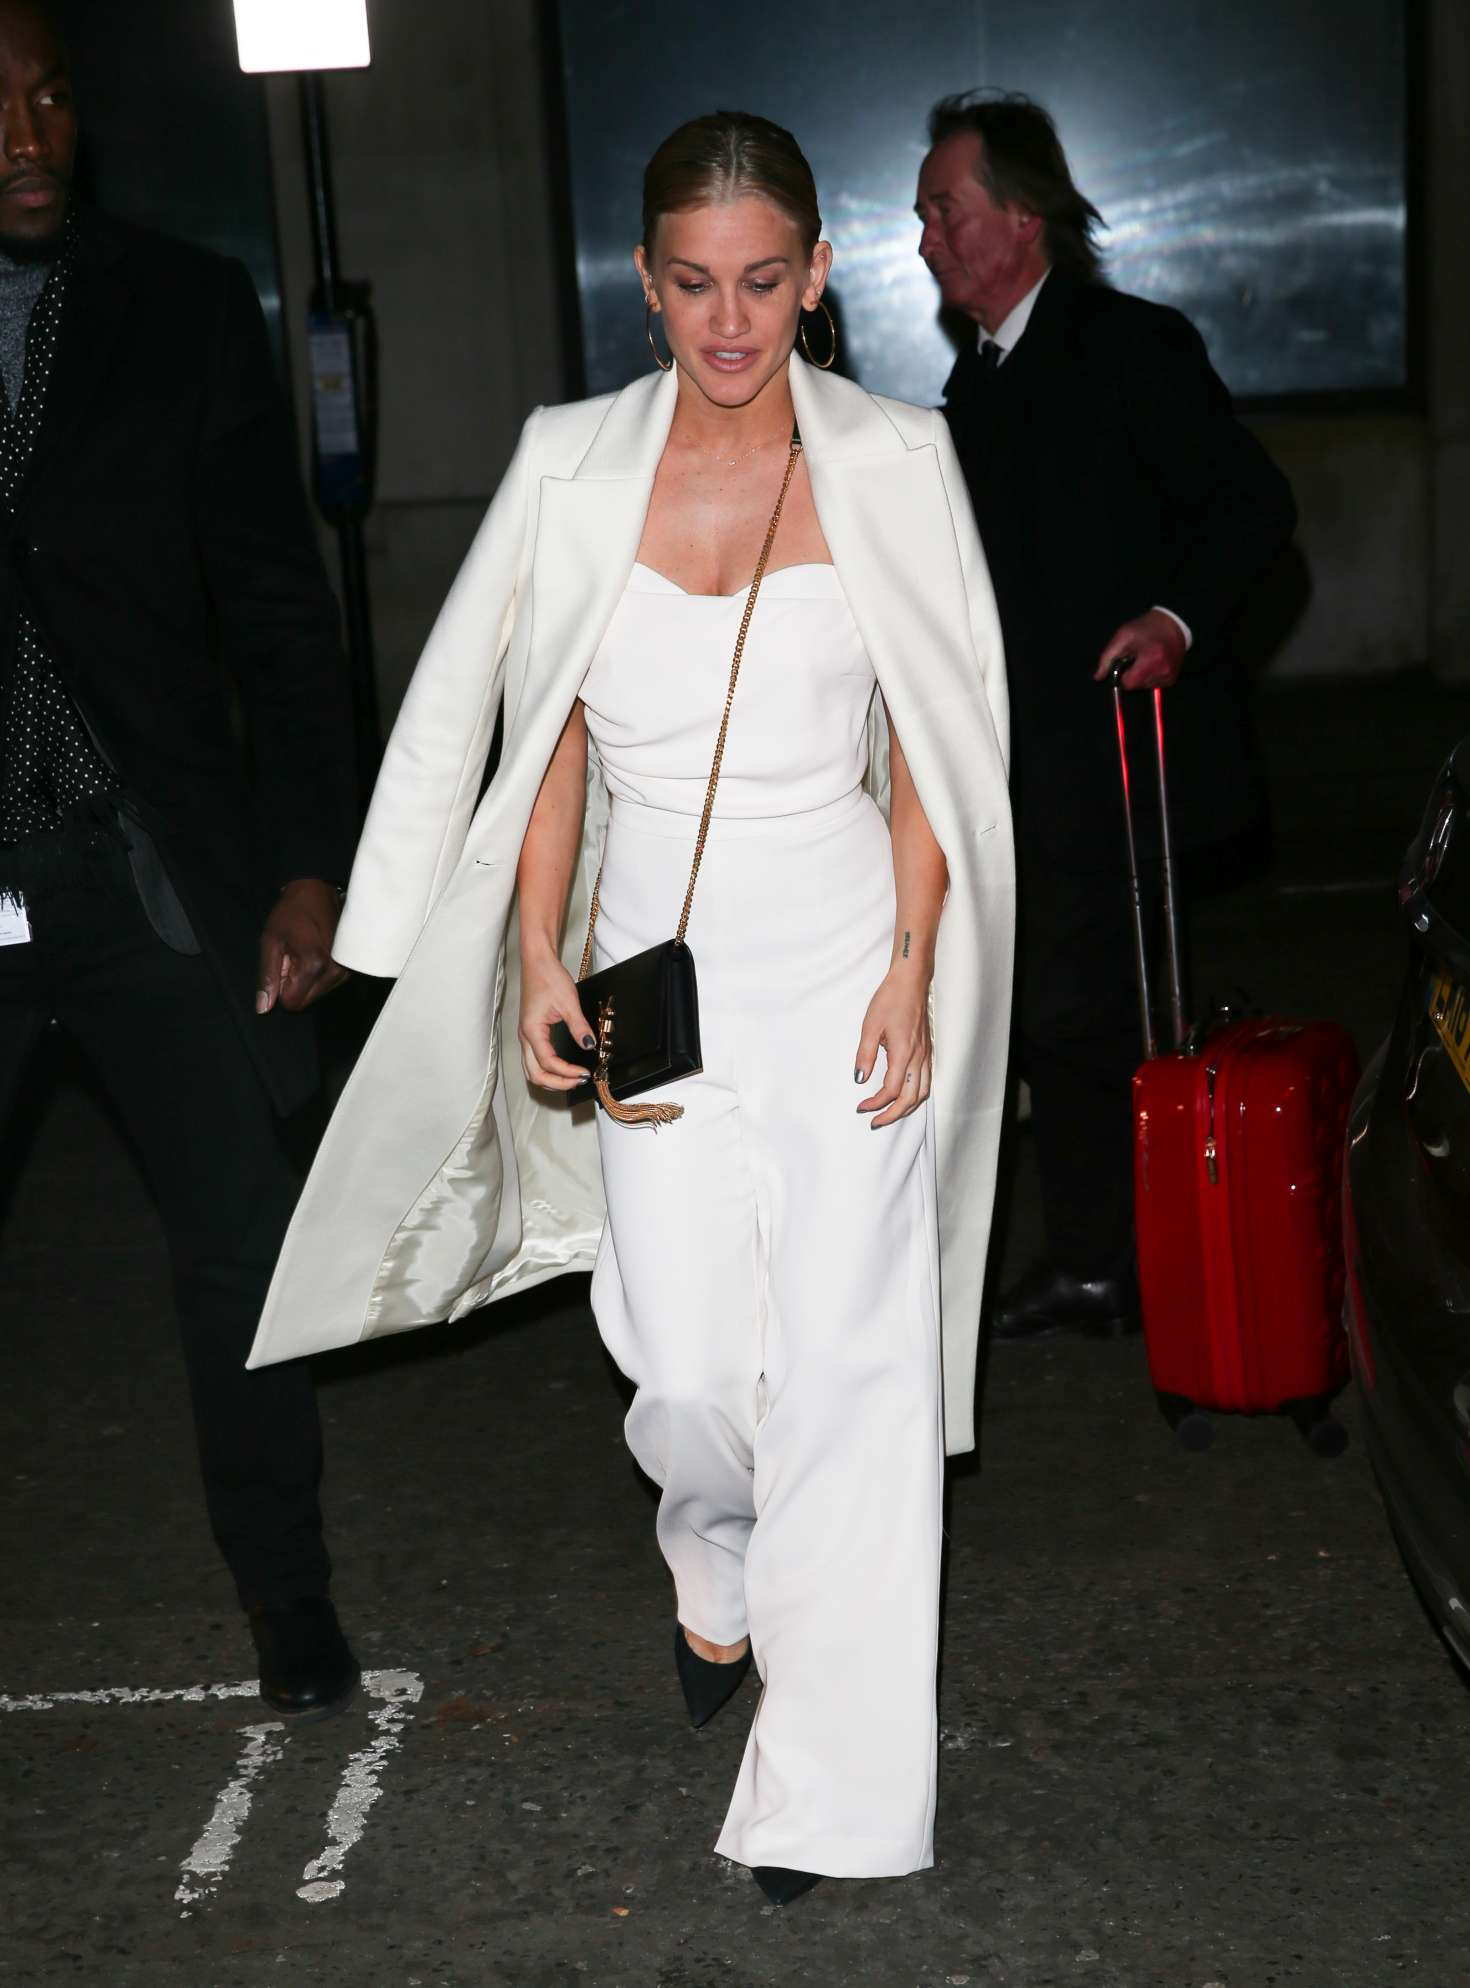 Ashley Roberts 2018 : Ashley Roberts: Arriving on Chris Evans Breakfast Show -03